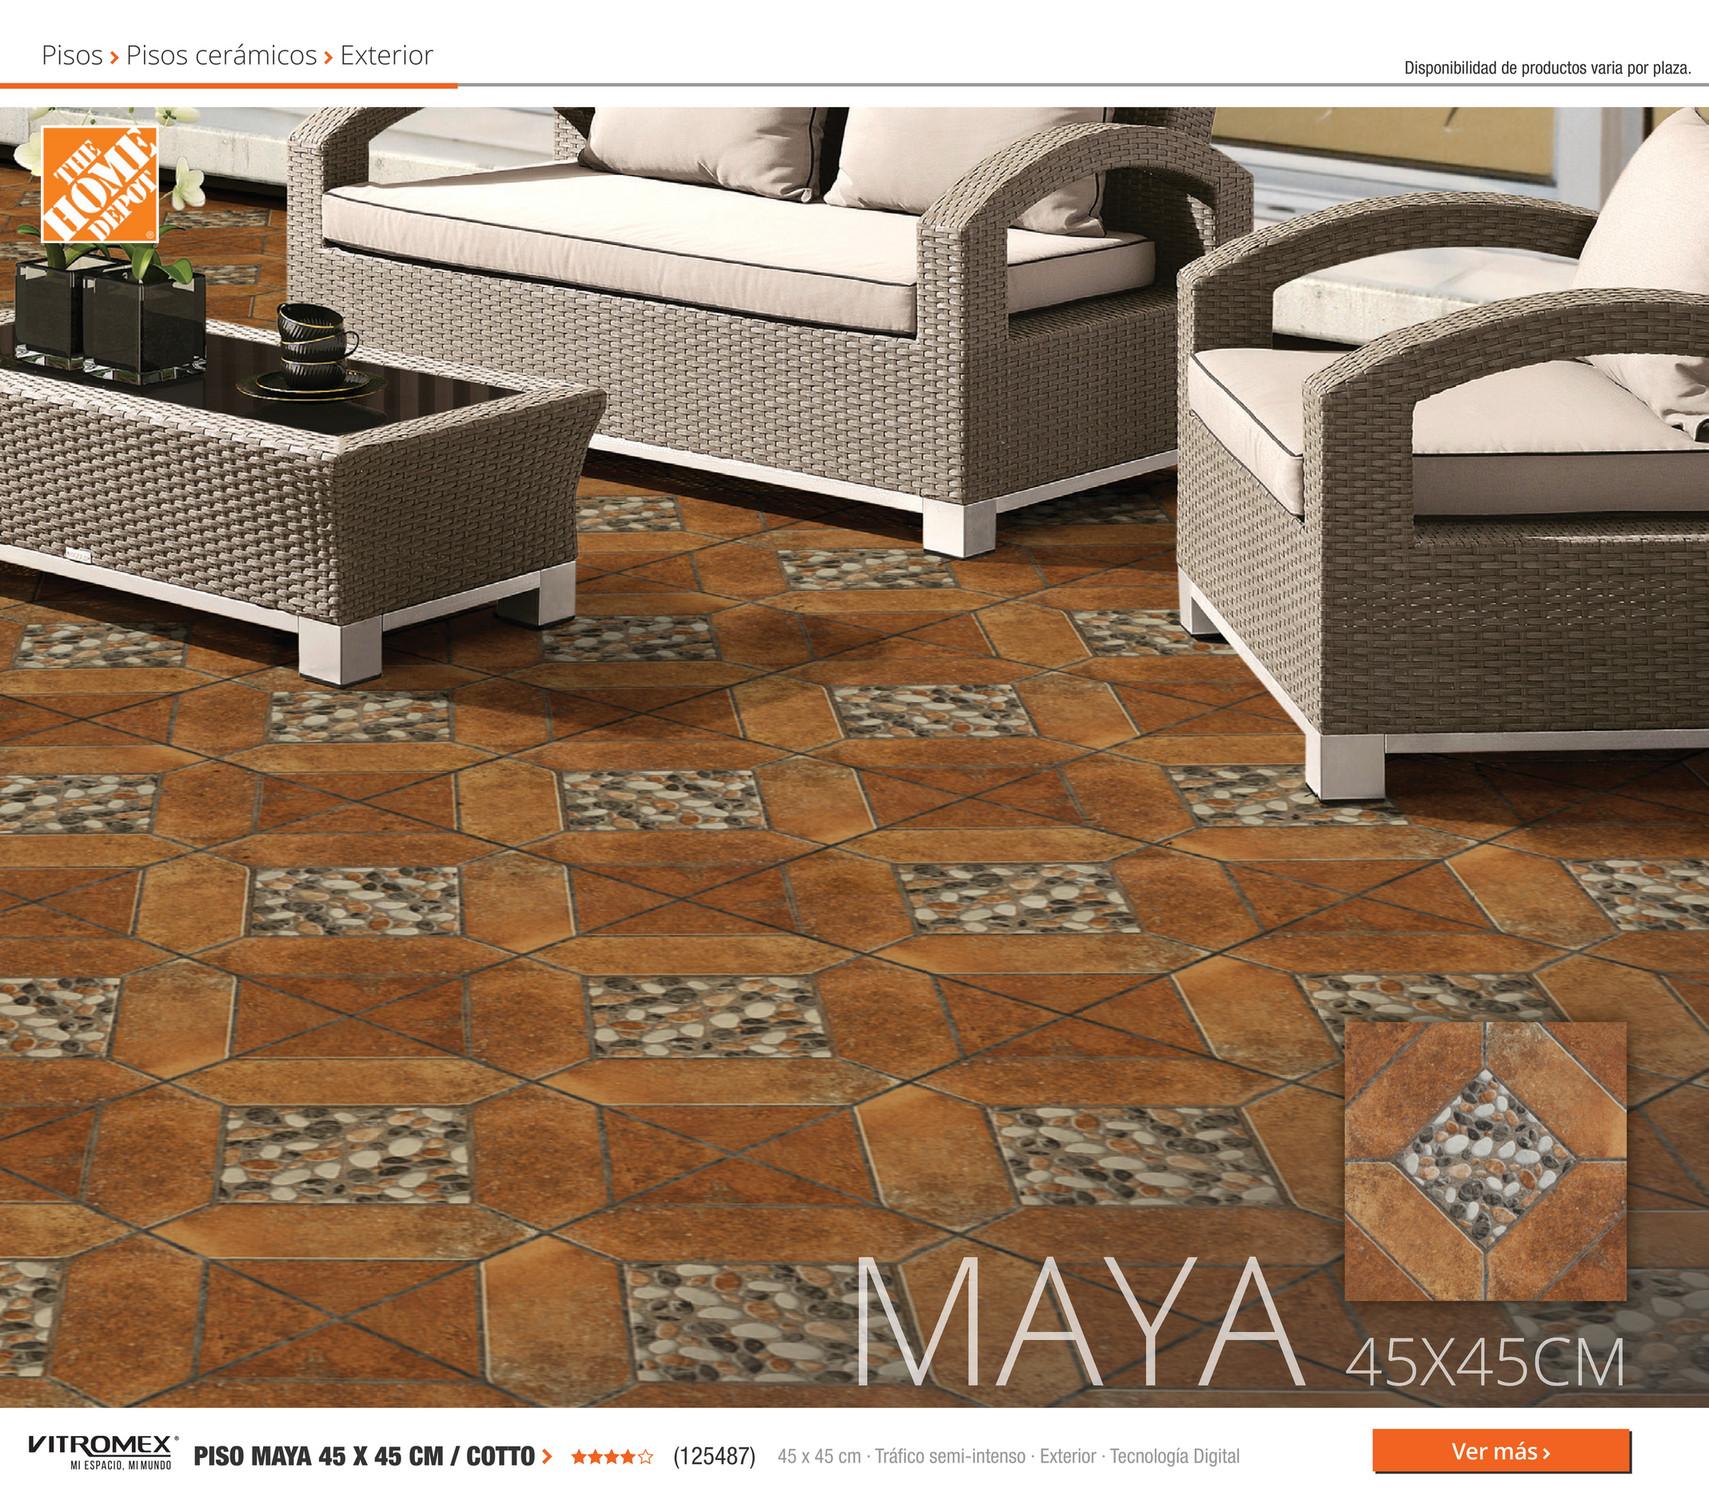 The home depot ceramic tile